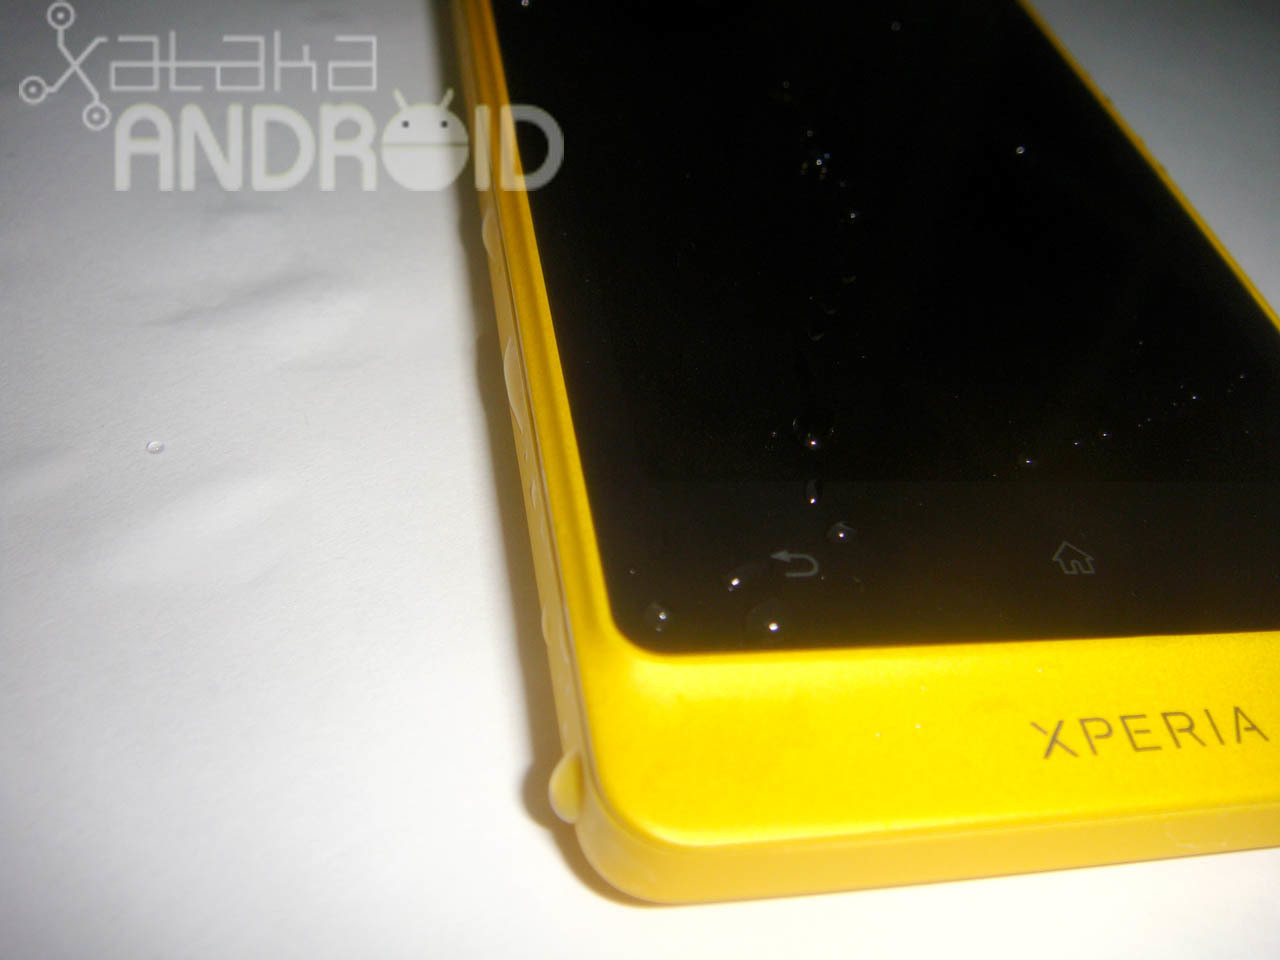 Foto de Análisis del Sony Xperia go (8/36)